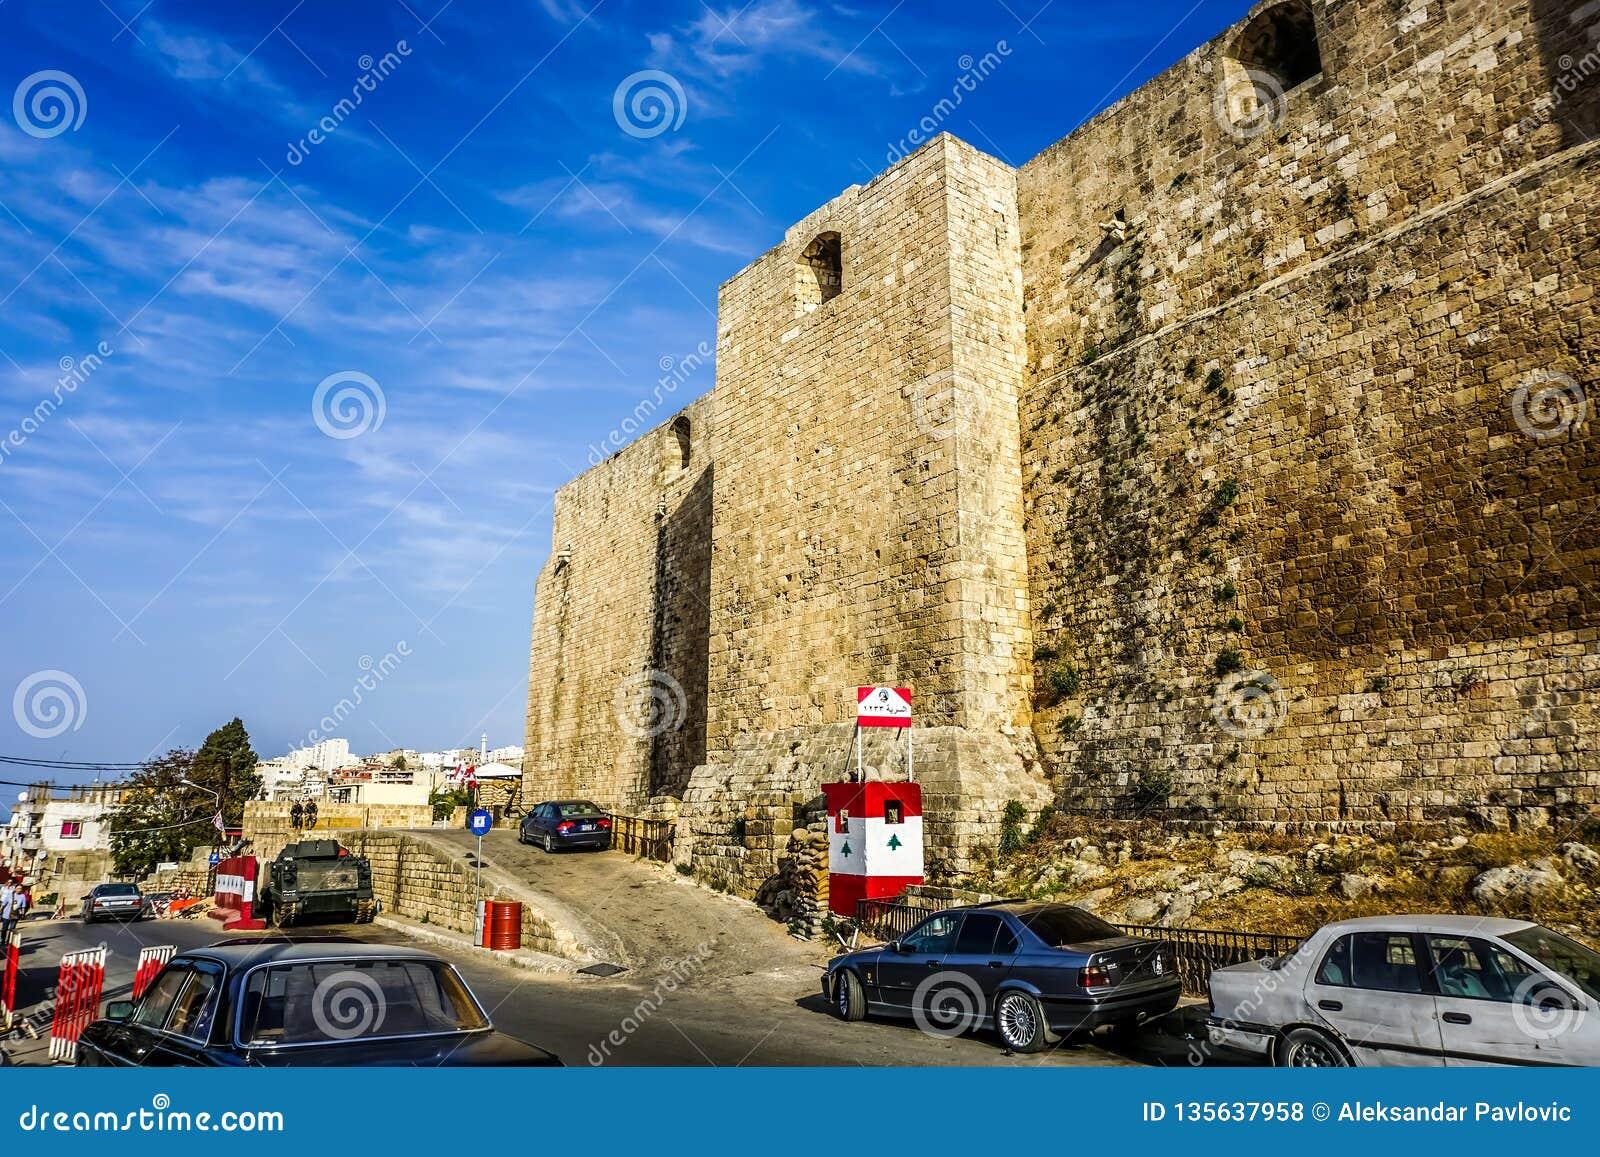 Tripoli Raymond De Saint Gilles Citadel